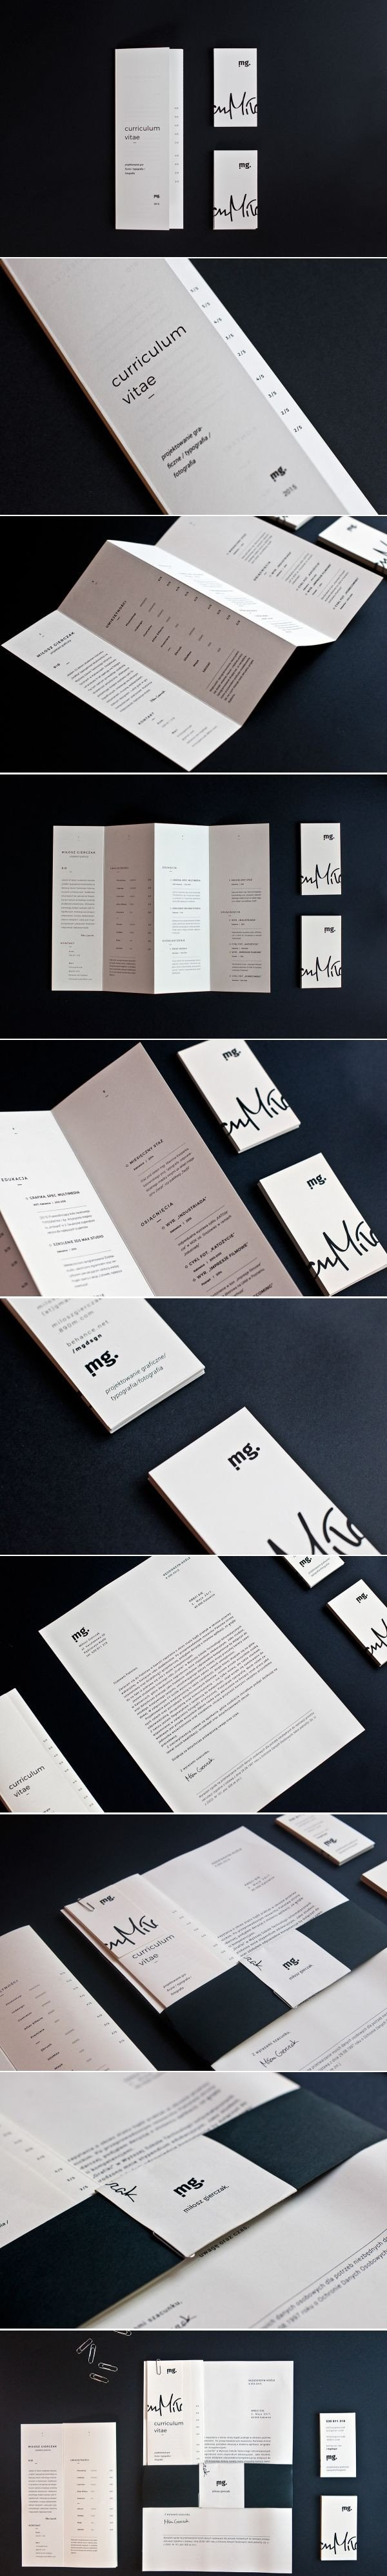 Quad Fold Brochure Template 1000 Ideas About Cv Design On Pinterest